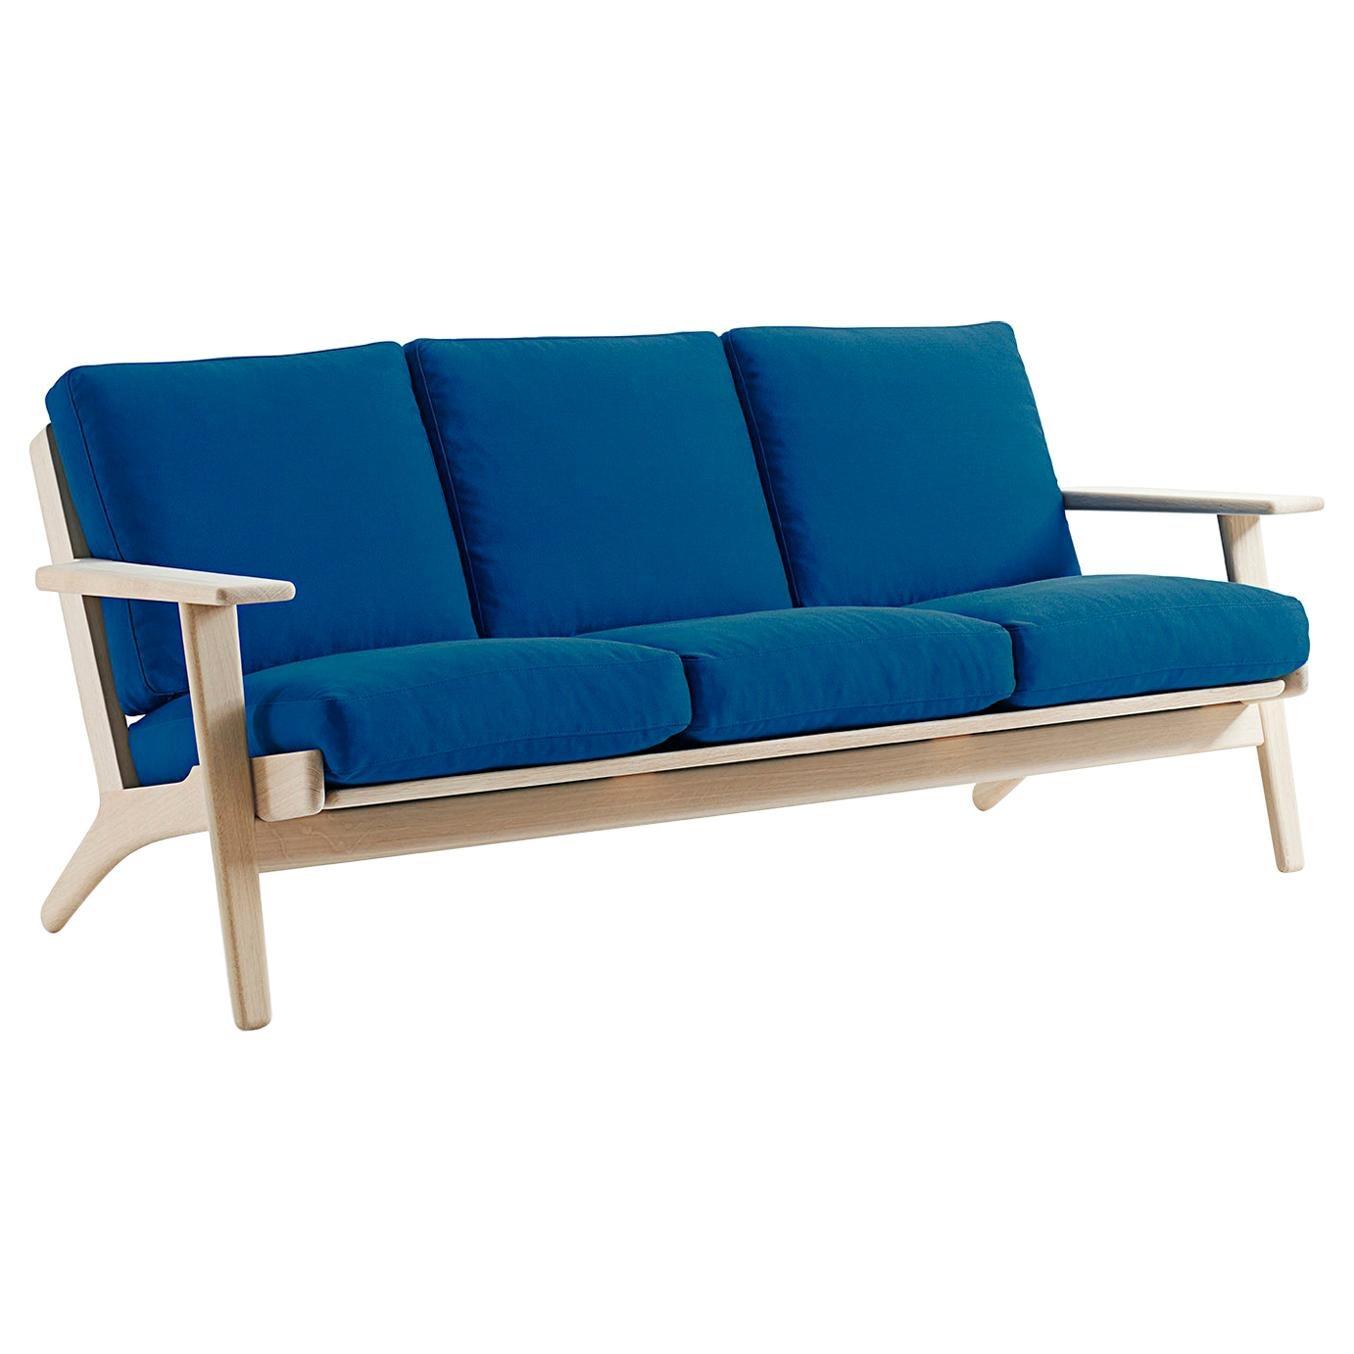 Hans Wegner GE-290/3 Sofa